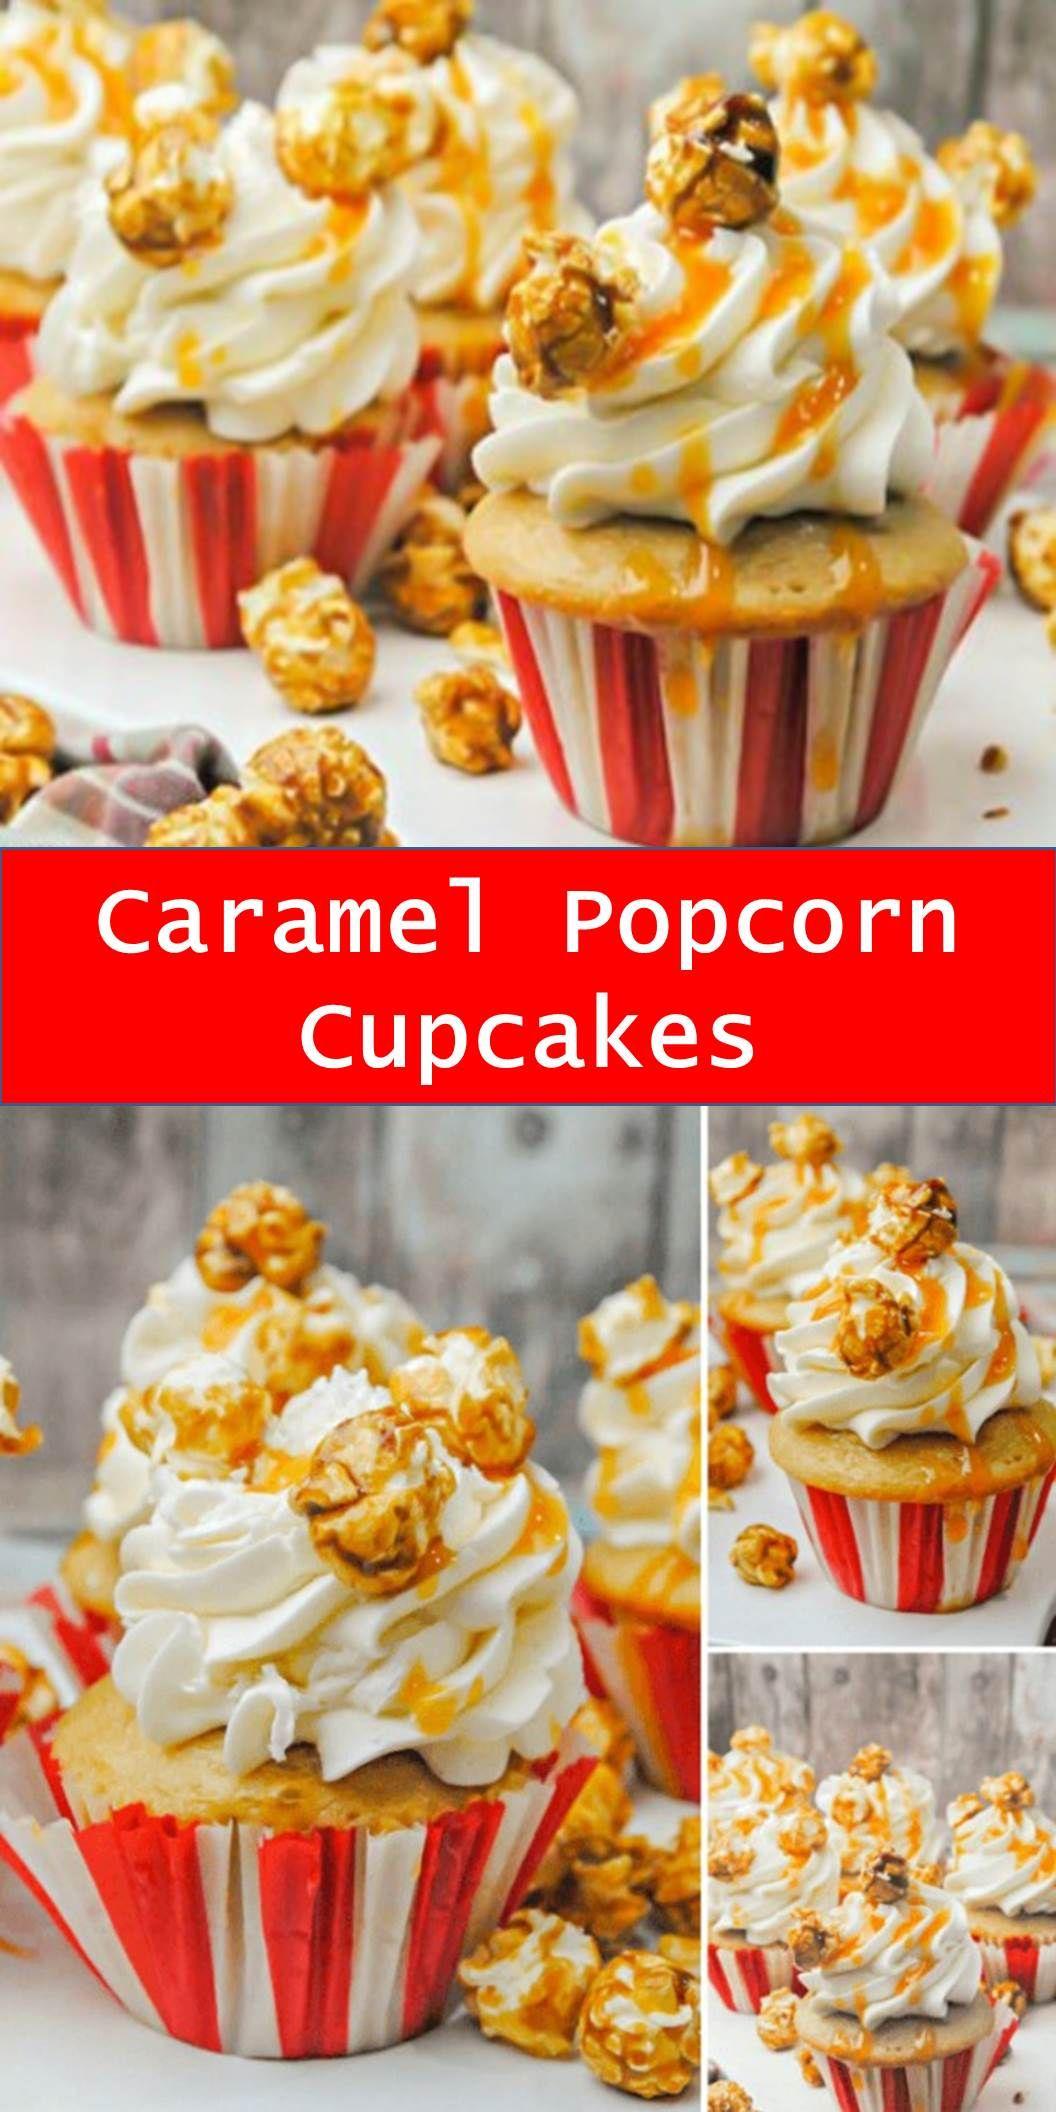 Sweet Caramel Popcorn Cupcakes Recipe Popcorn Cupcakes Cupcake Recipes Vanilla Cupcake Recipe